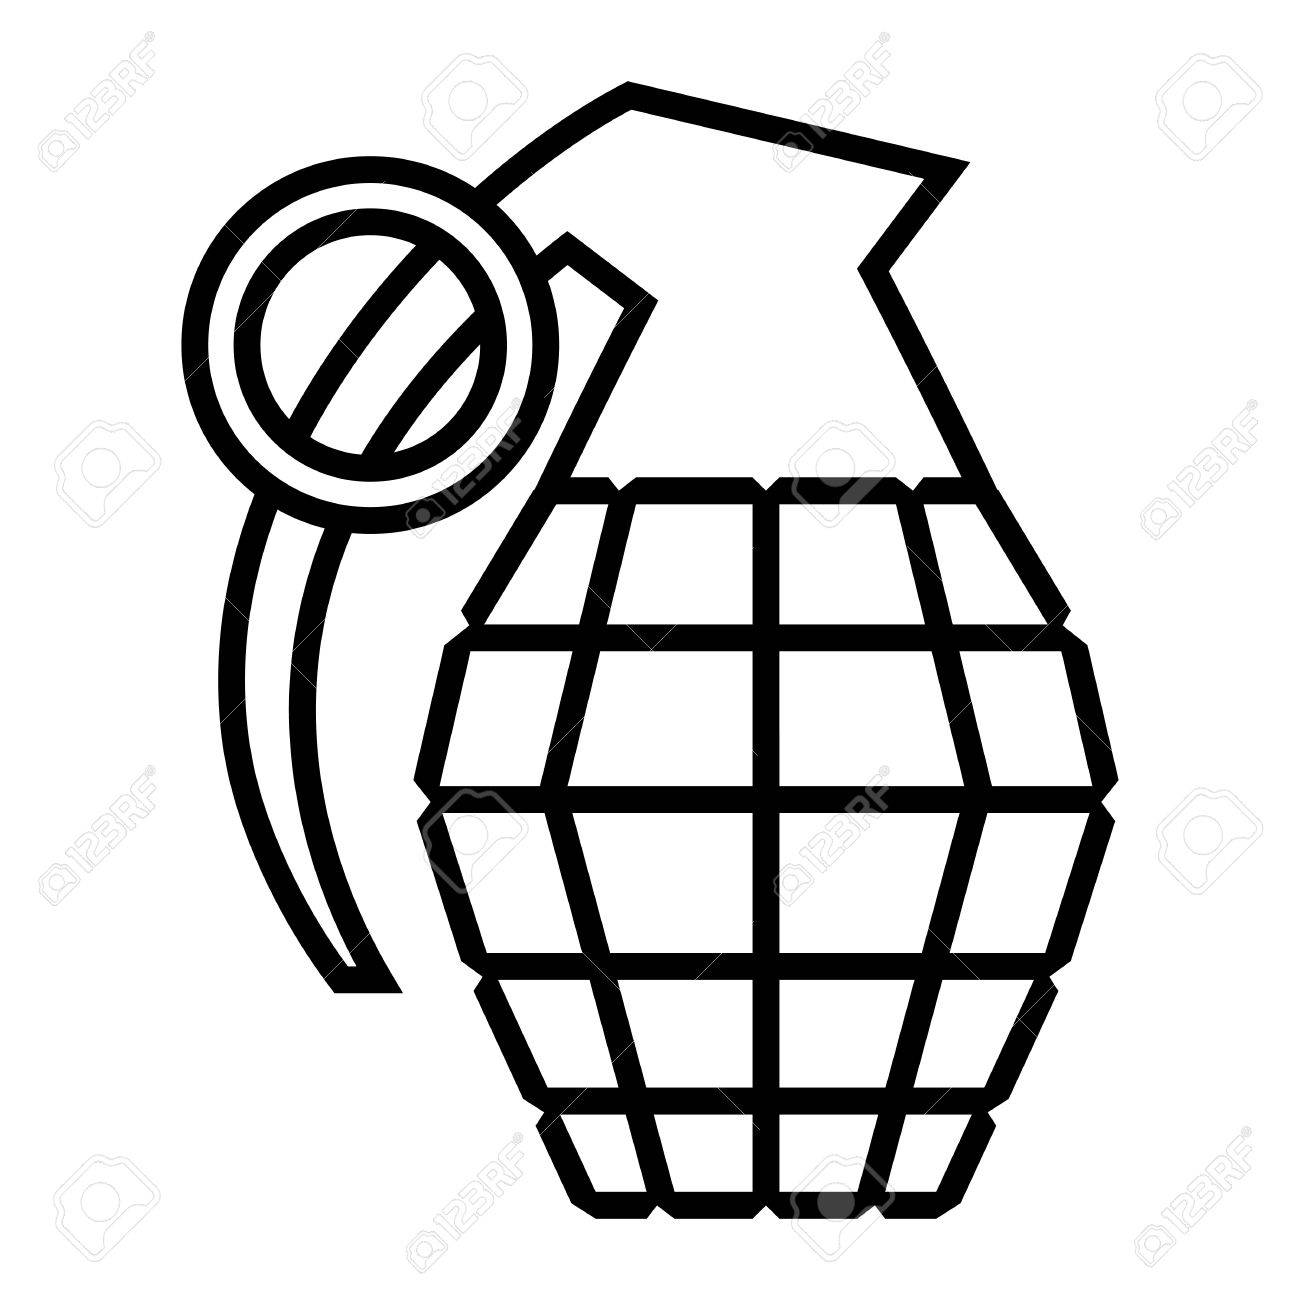 hand grenade vector illustration royalty free cliparts vectors and rh 123rf com hand grenade vector free